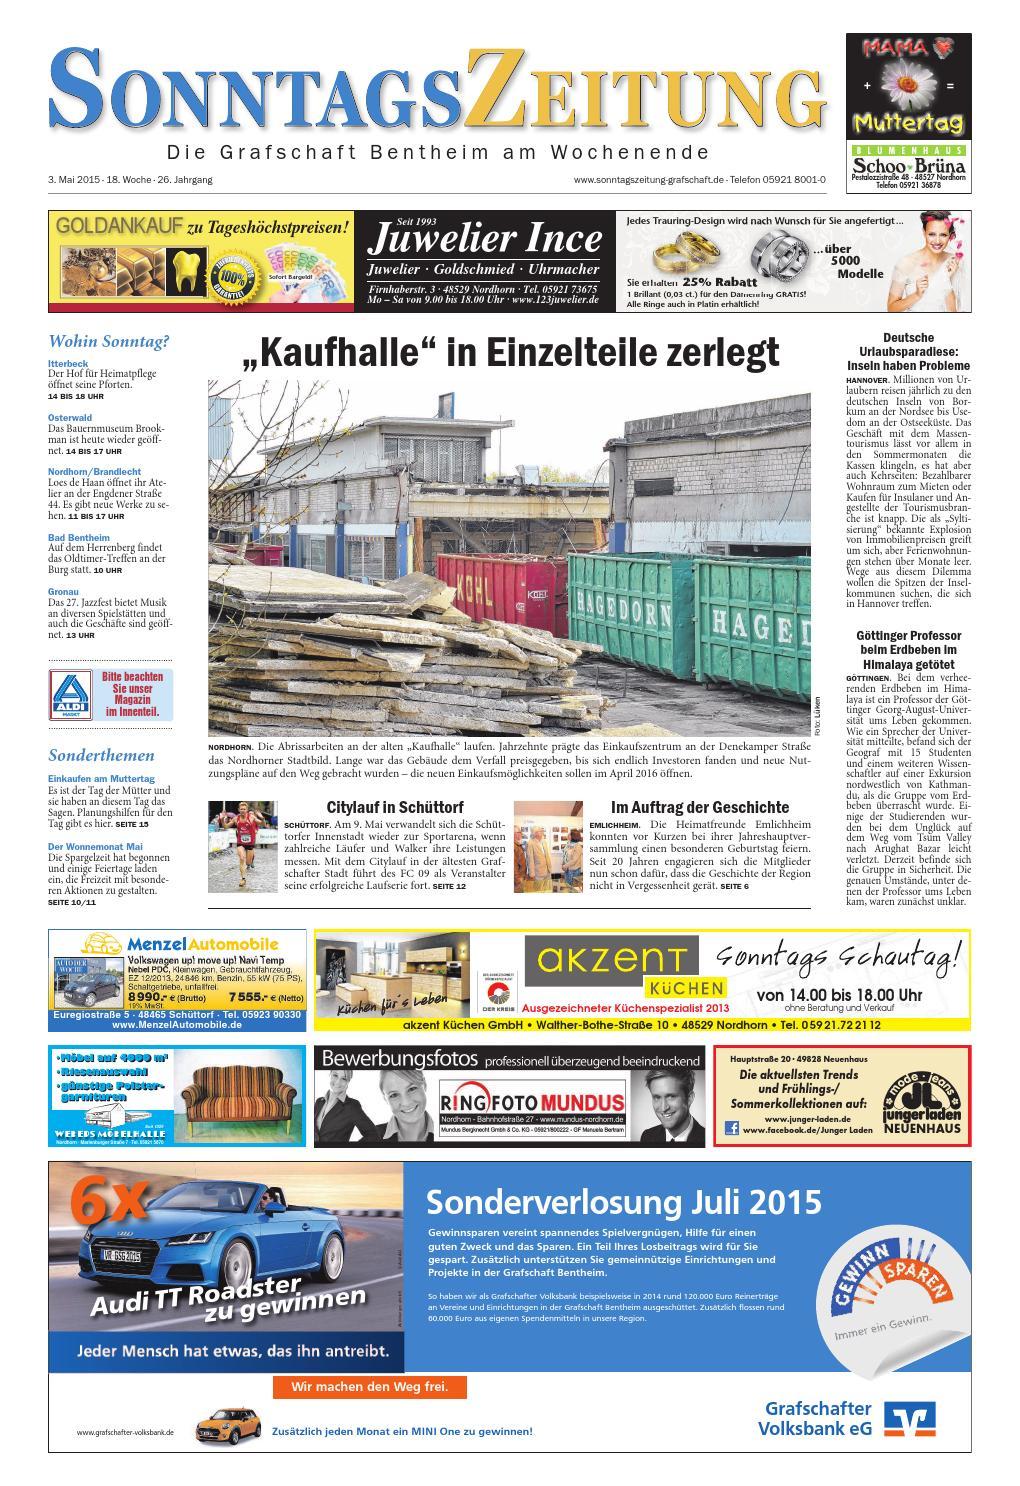 Sonntagszeitung 3 5 2015 By Sonntagszeitung Issuu